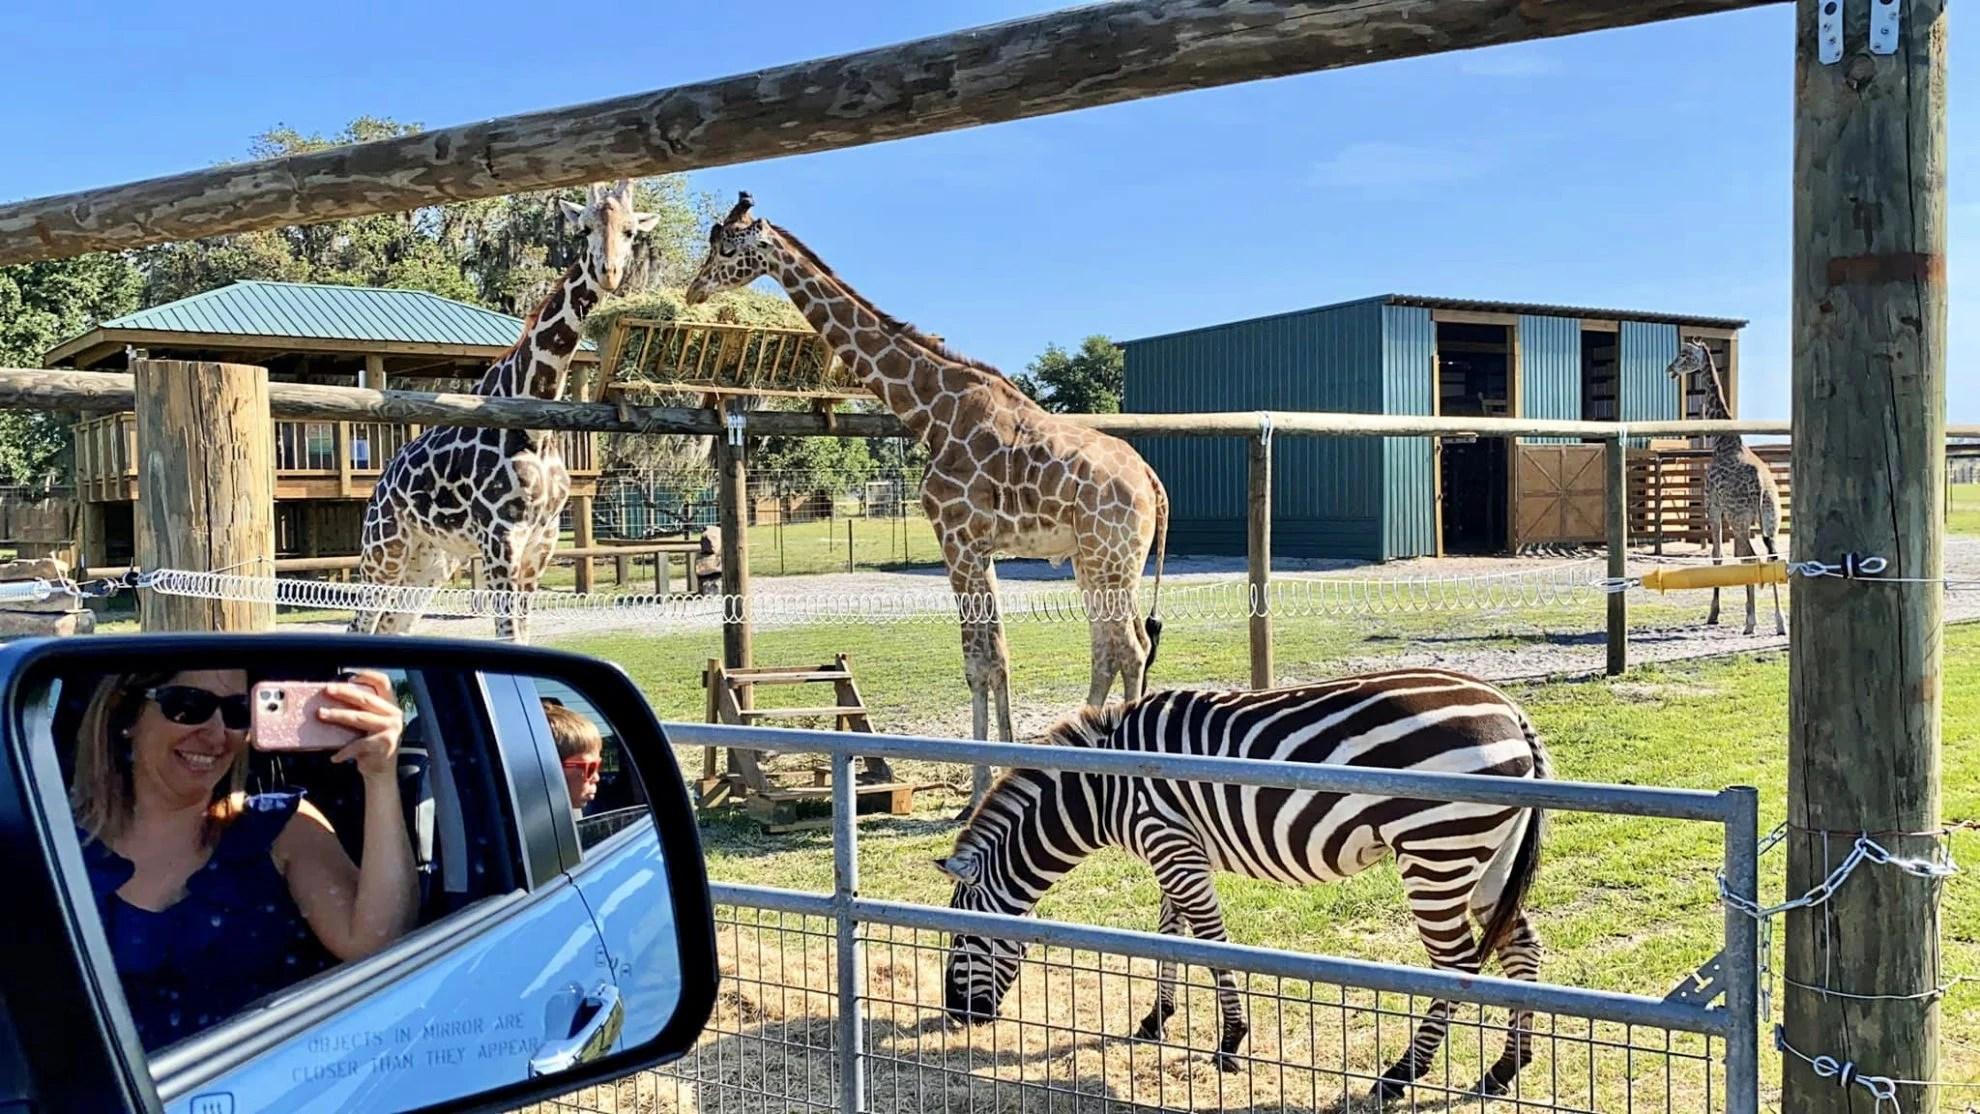 Zebras and Giraffes at Wild Florida Drive-Thru Safari Park